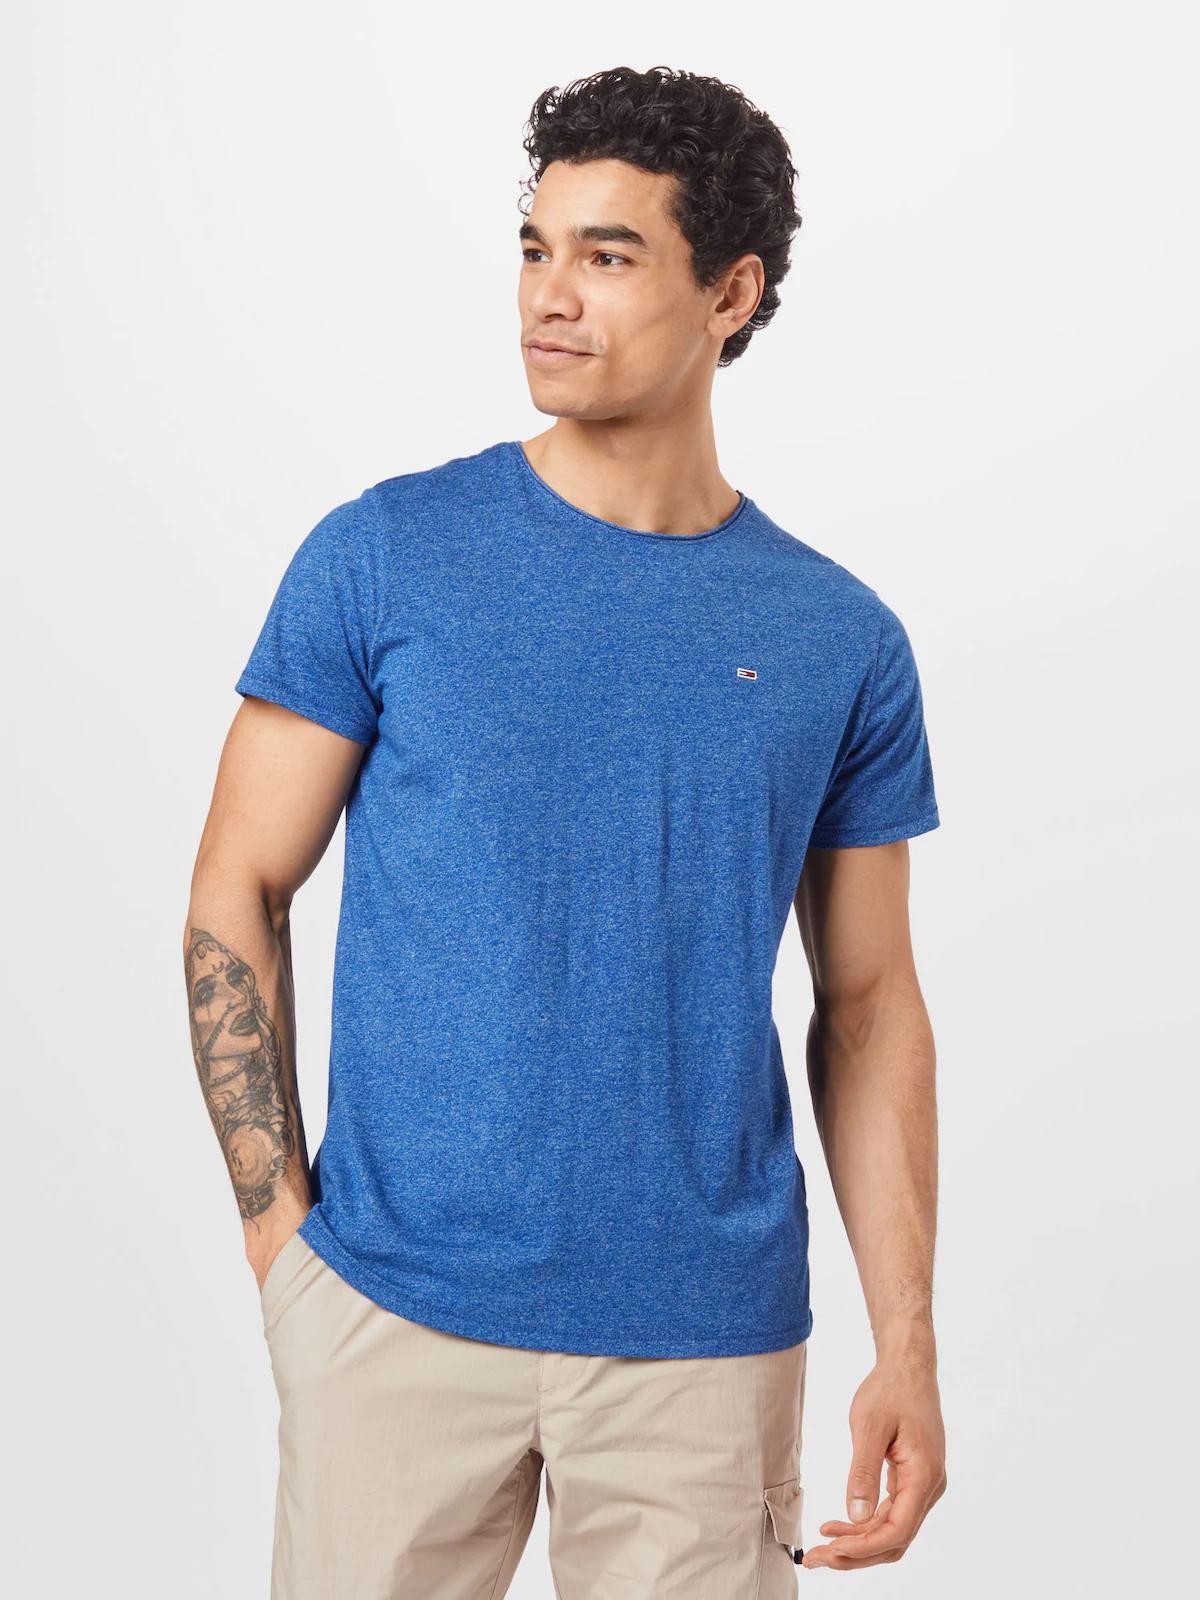 Camiseta Tommy Jeans talla XS